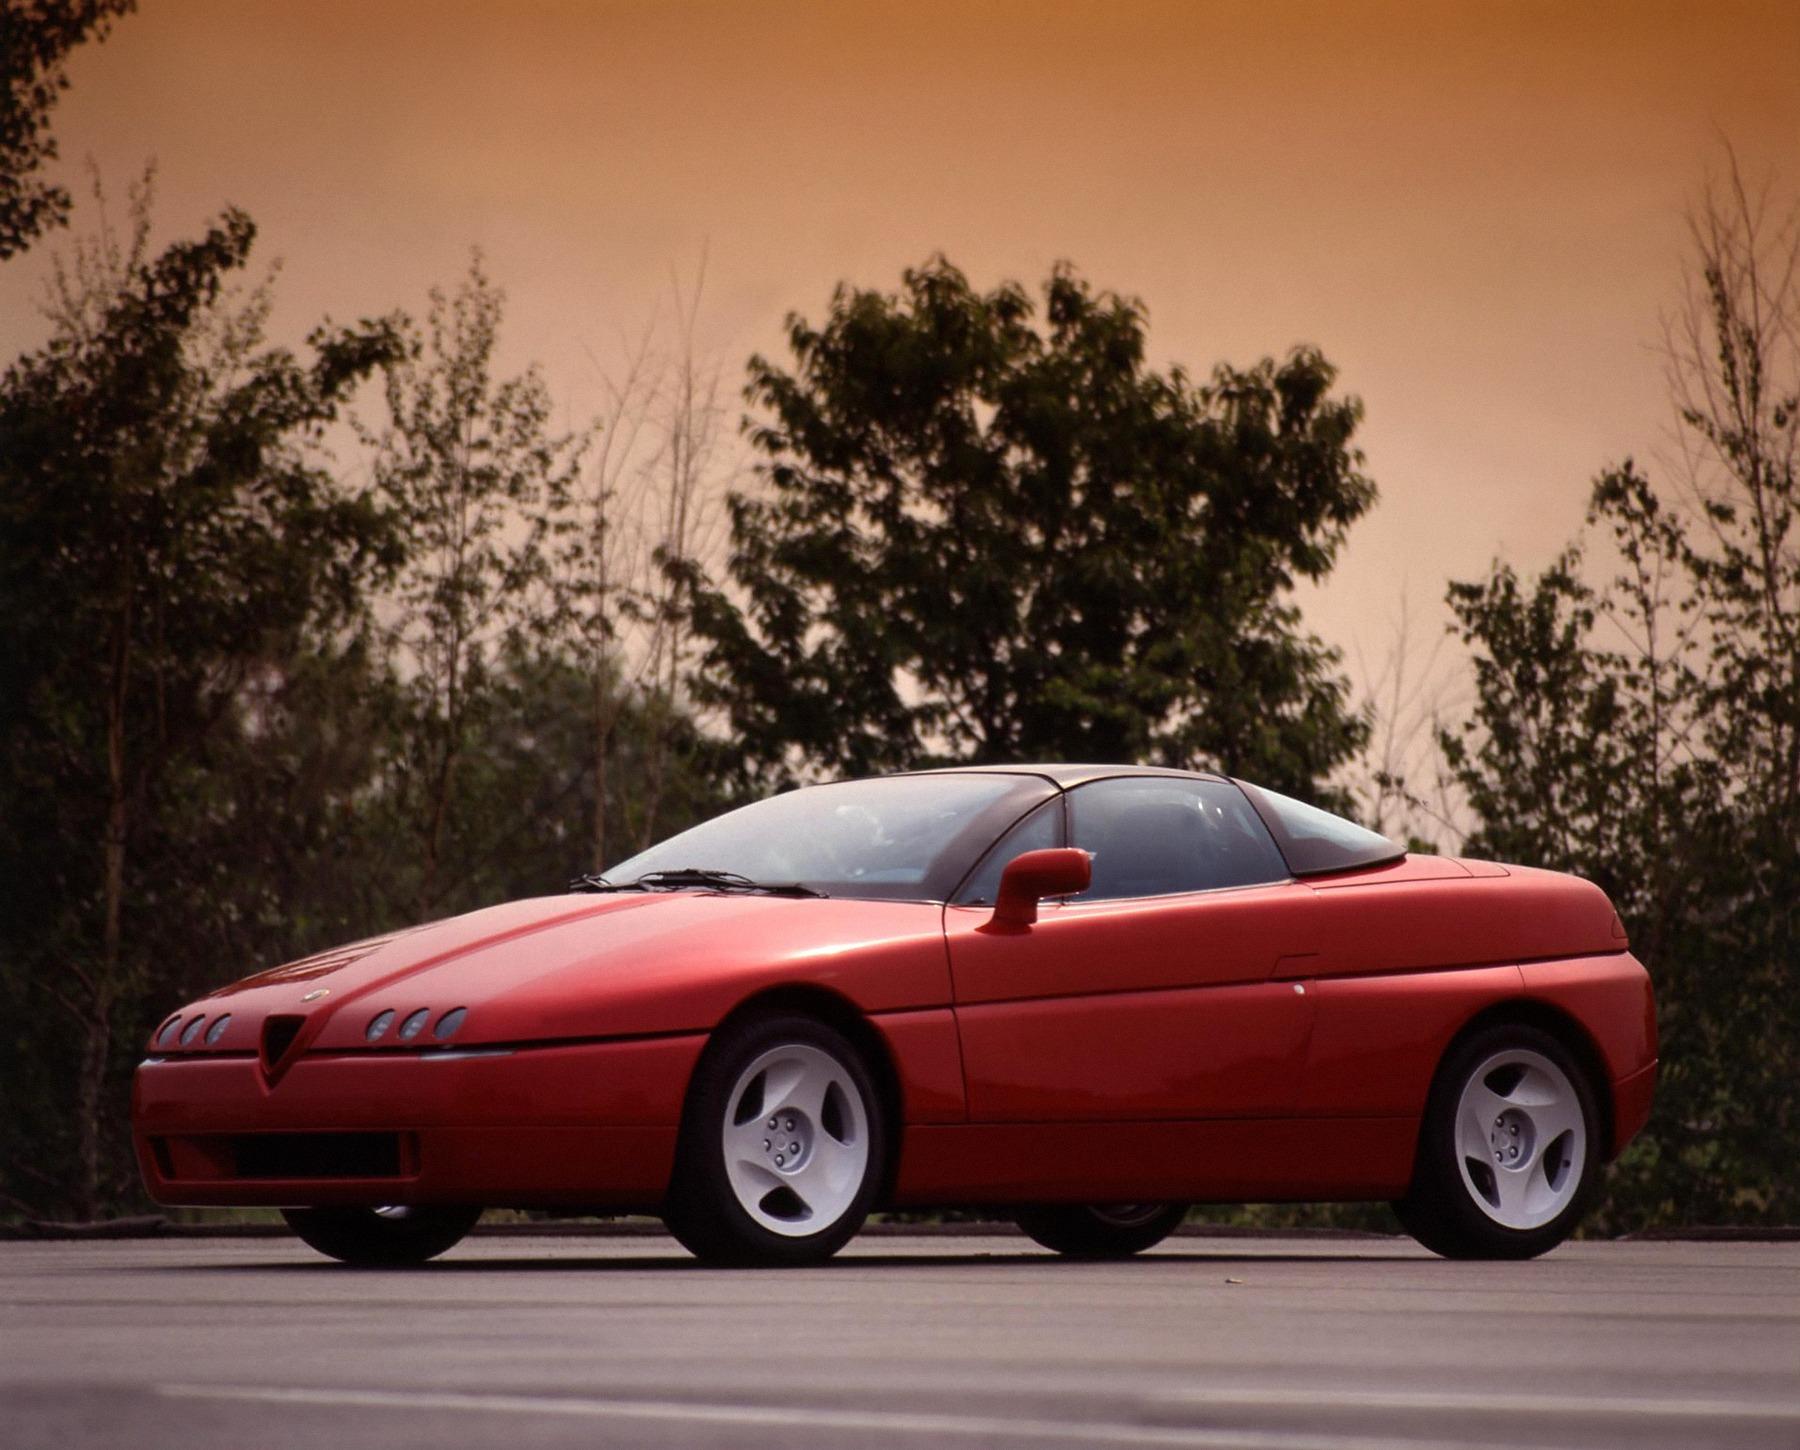 1991-Alfa-Romeo-164-Proteo-01